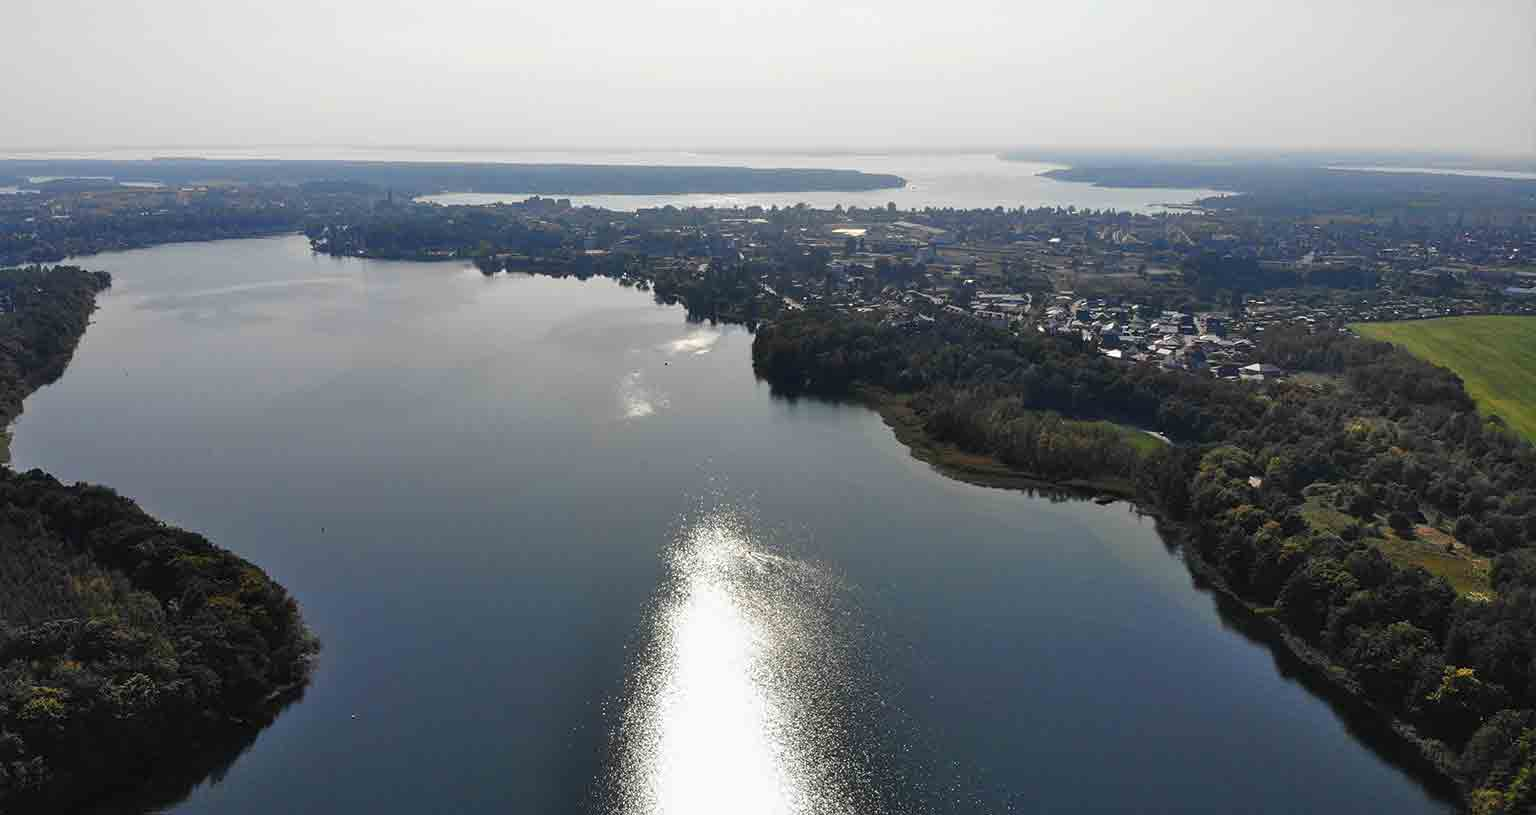 Peace Love Om Reiseland Deutschland Mecklenburgische Seenplatte Müritz